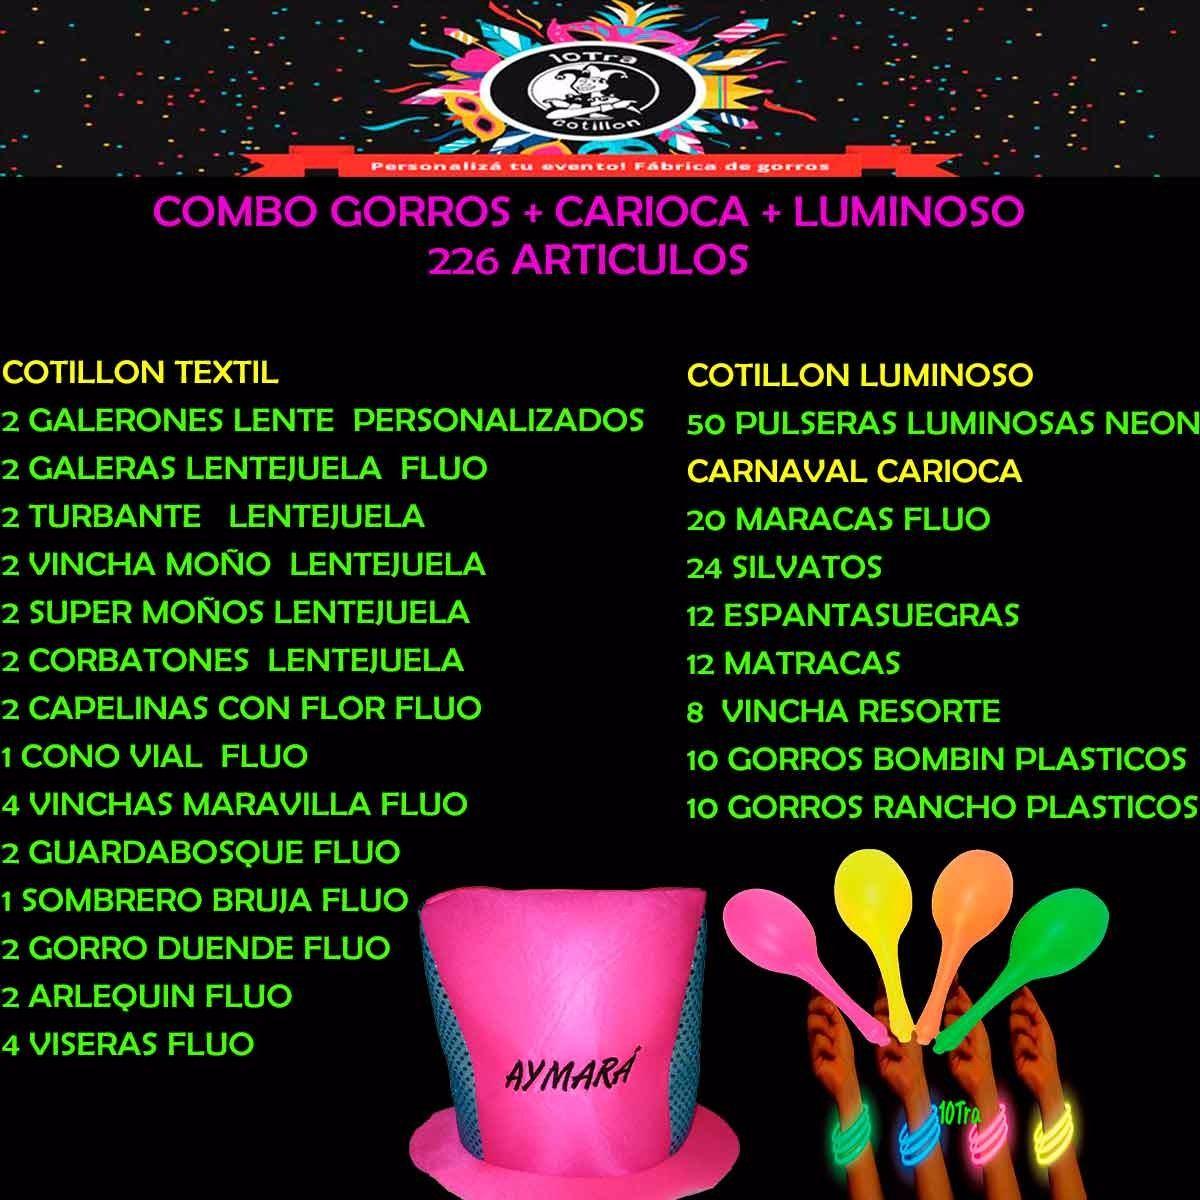 Cotillon 50 Personas Gorro Fluo + Carioca + Luminoso 226 Art ... eb51ed25c26